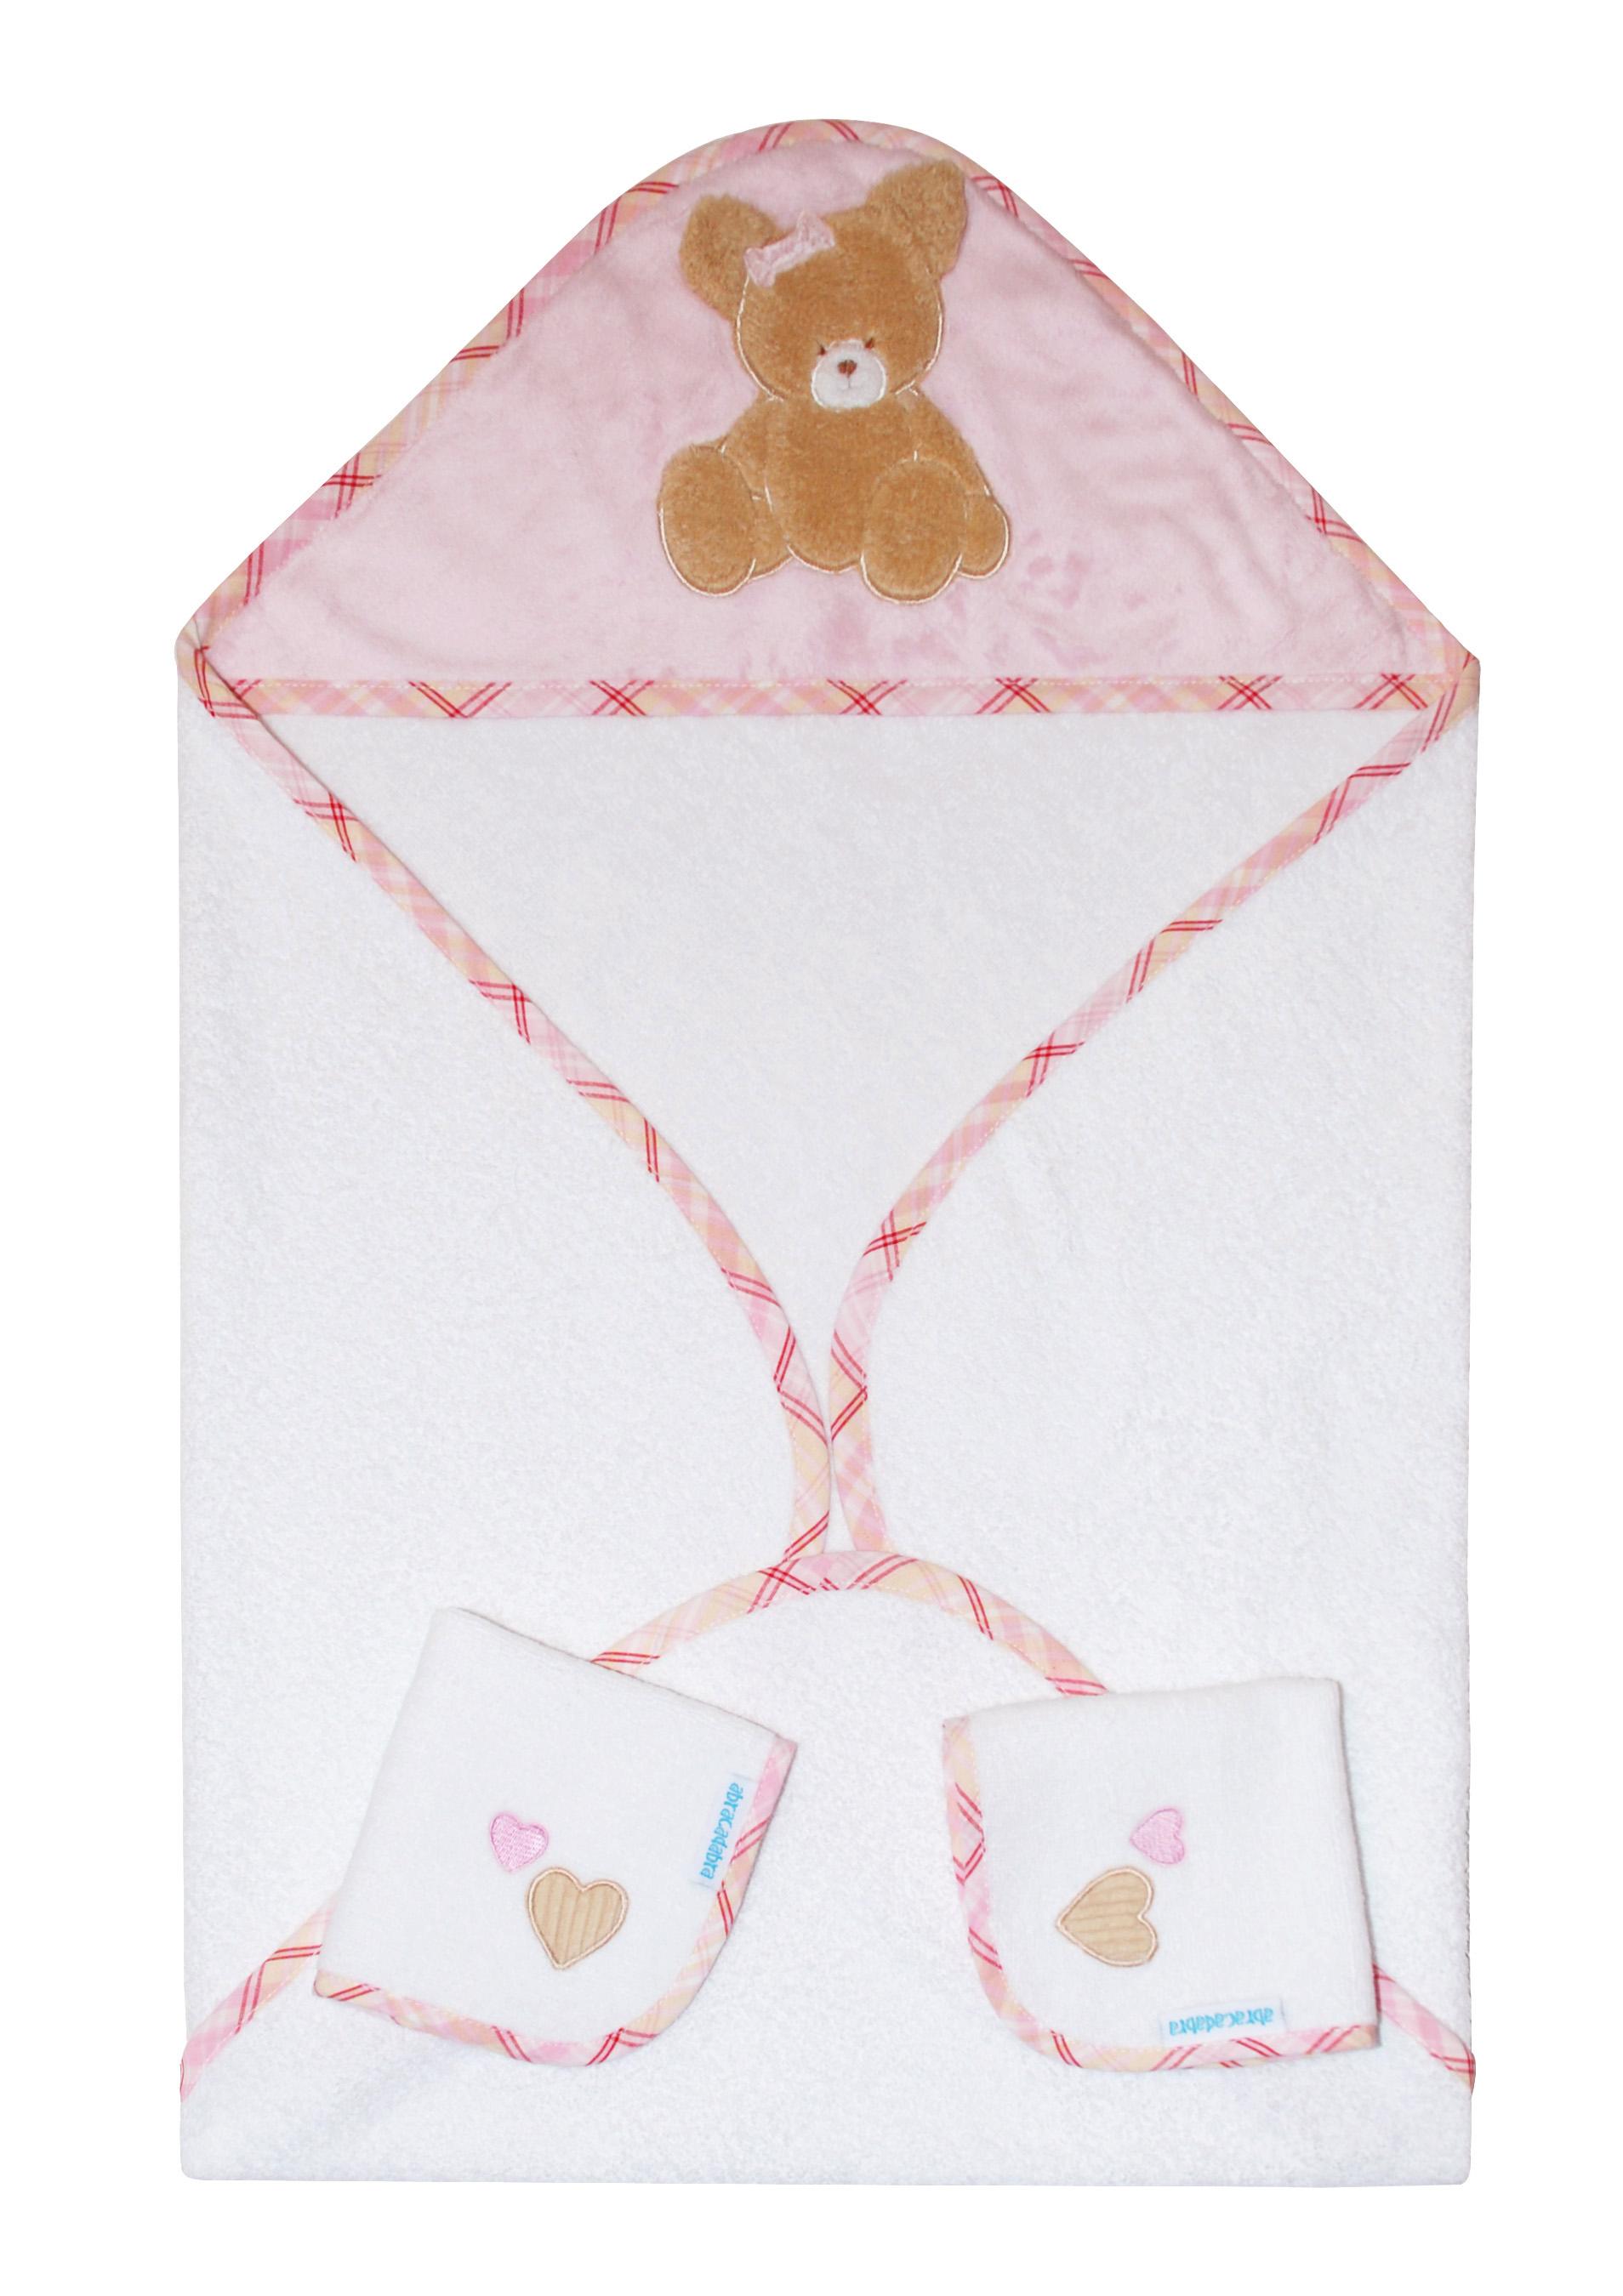 Mothercare | Abracadabra Hooded Towel Set - Tender Heart